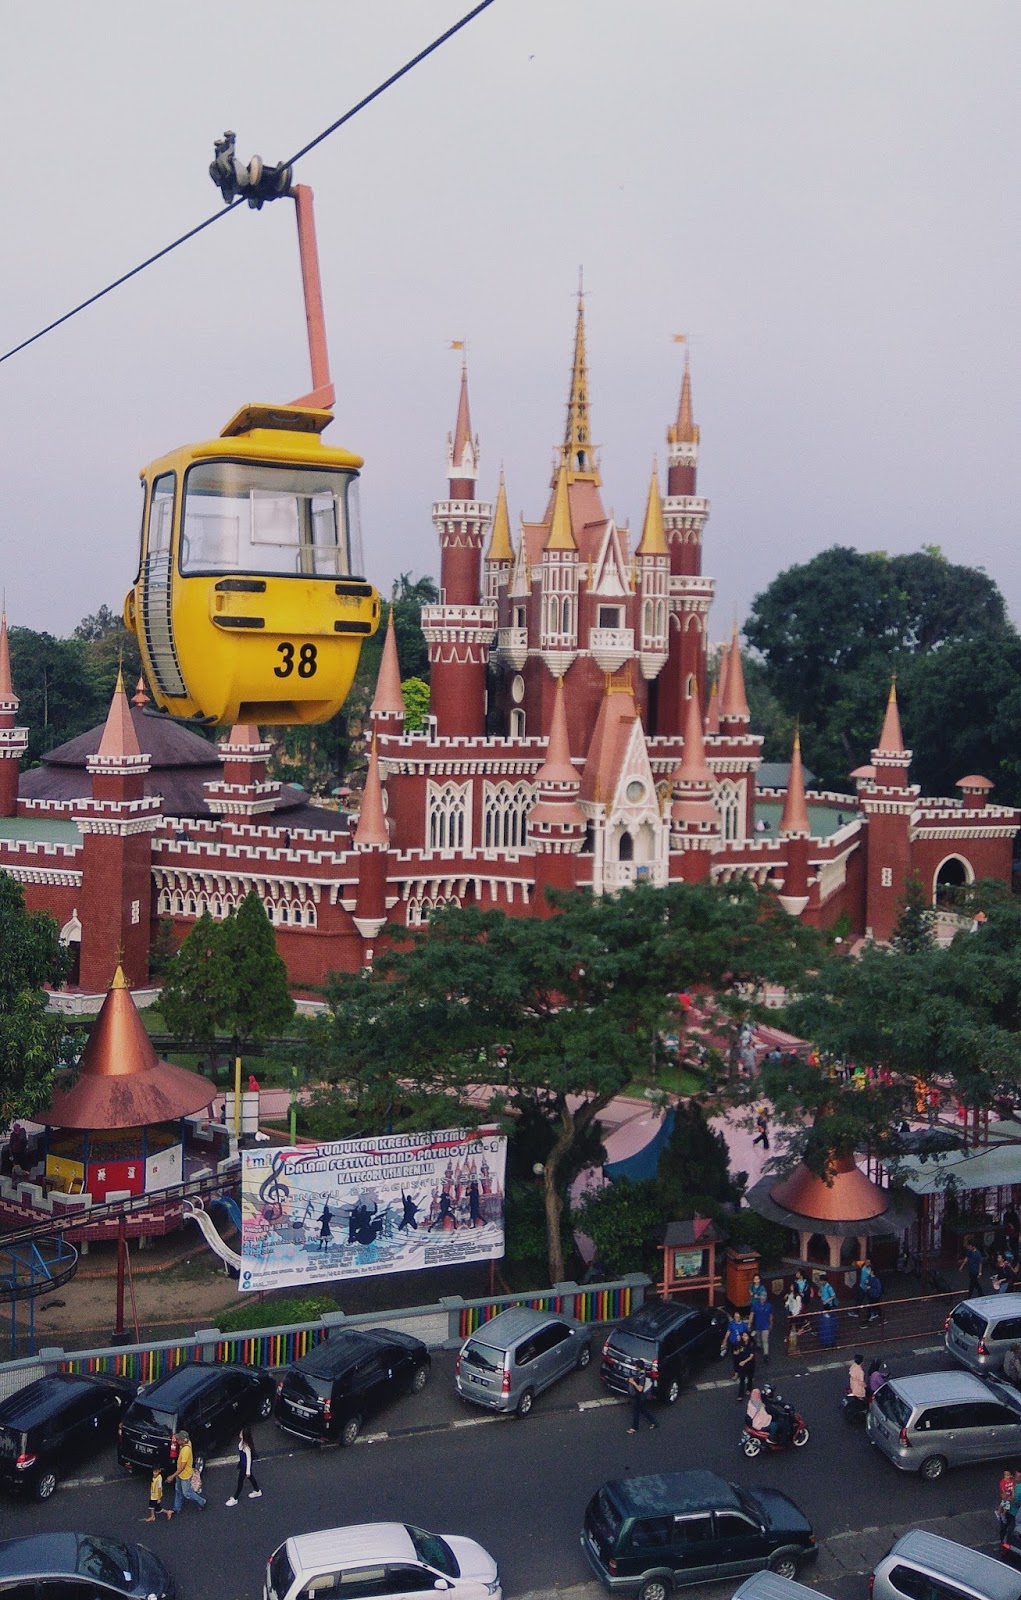 Kereta Gantung Sky Lift Tmii Keliling Indonesia Dengan Singkat